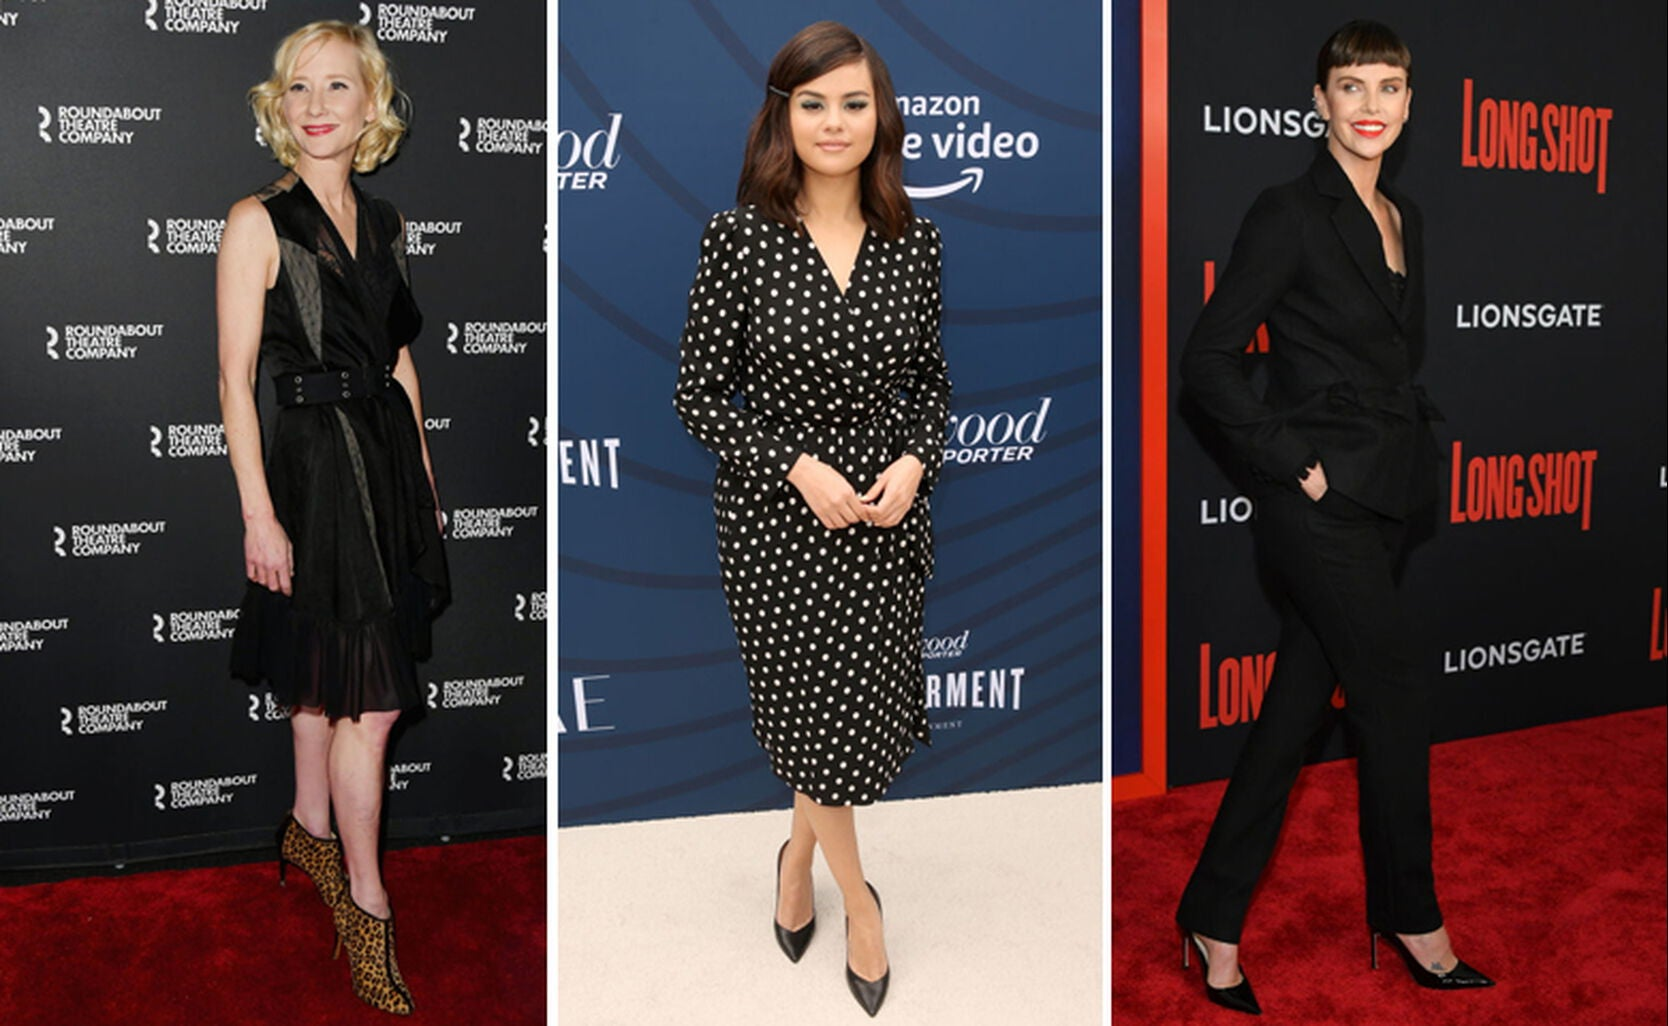 Anne Heche, Selena Gomez, Charlize Theron